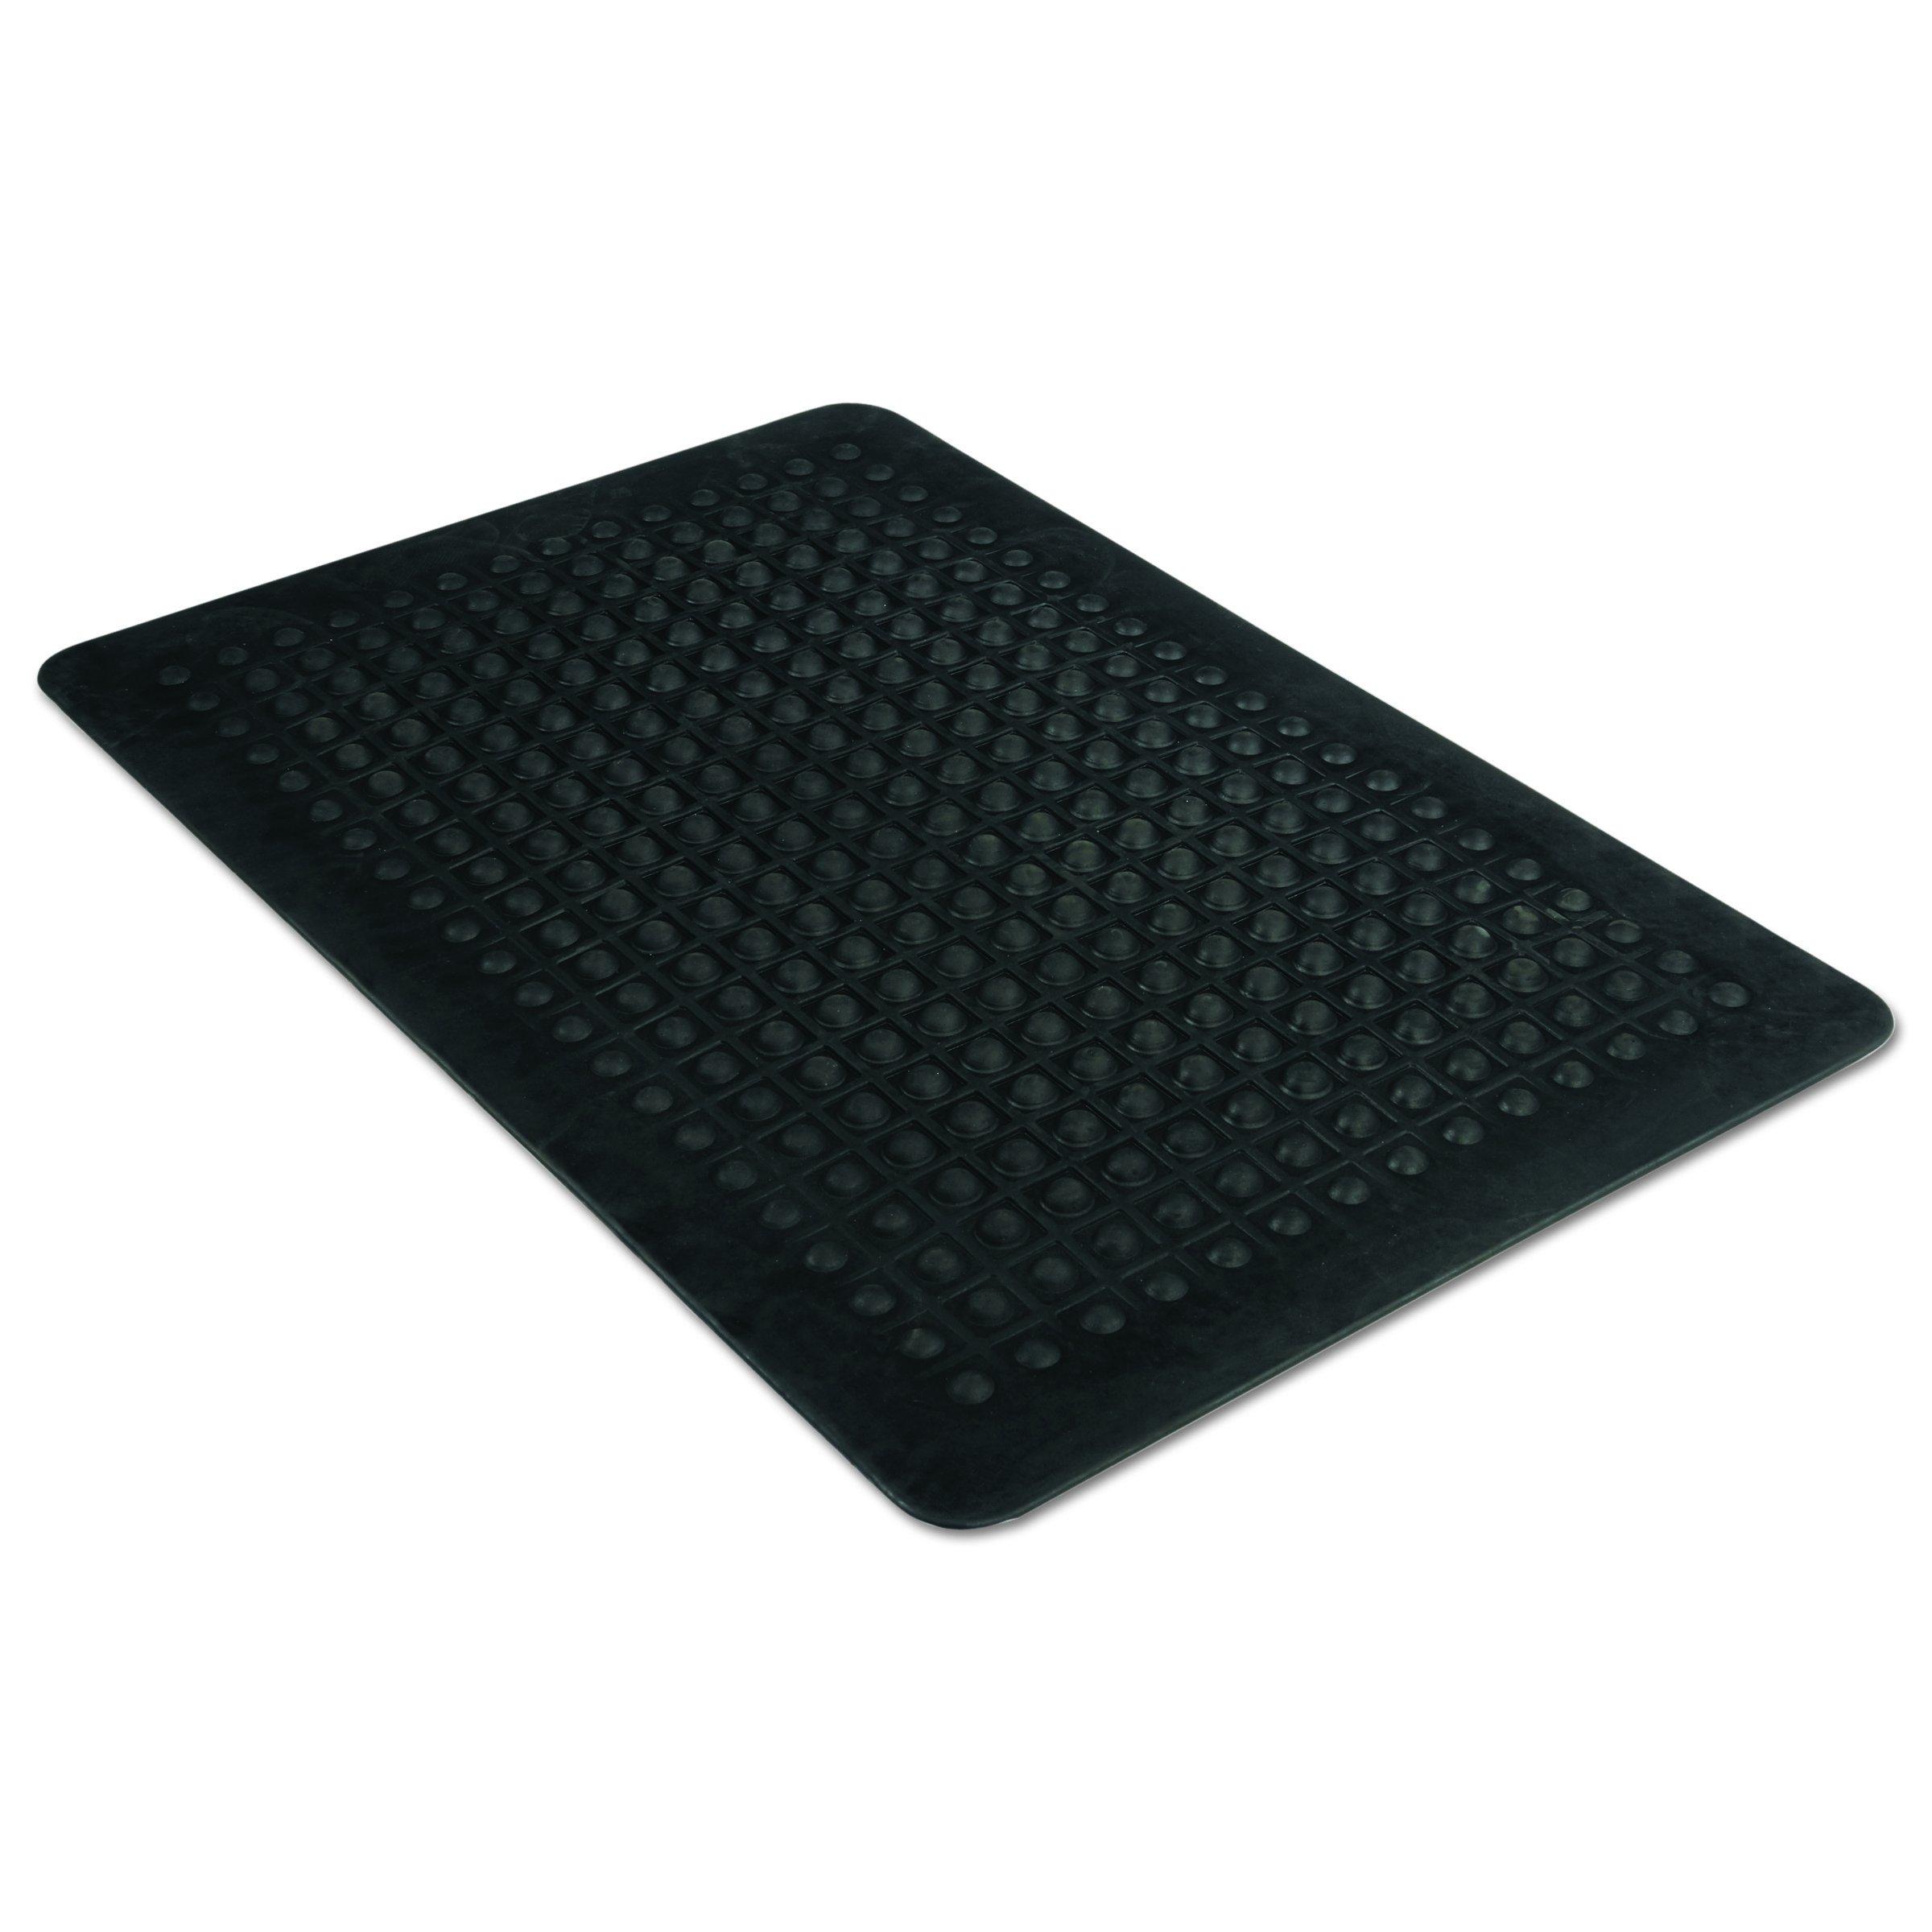 Guardian Flex Step Antifatigue Floor Mat, Rubber, 3'x5', Black